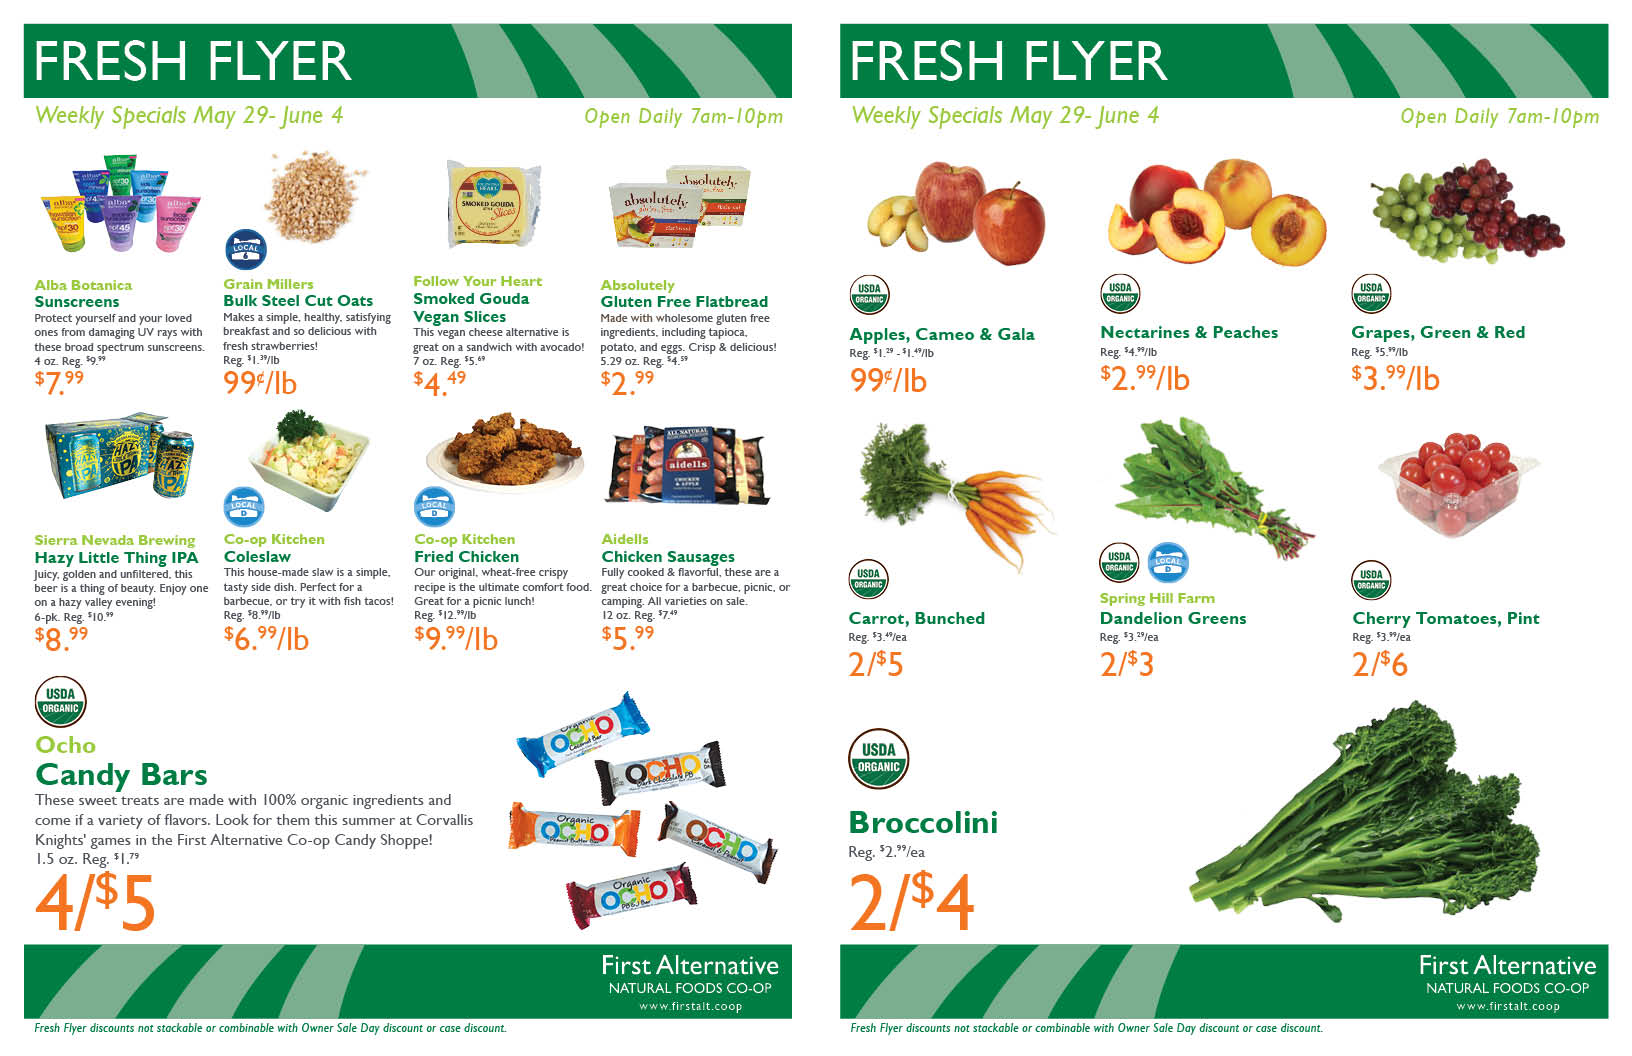 First Alternative Co-op Fresh Flyer May 29 - June 4